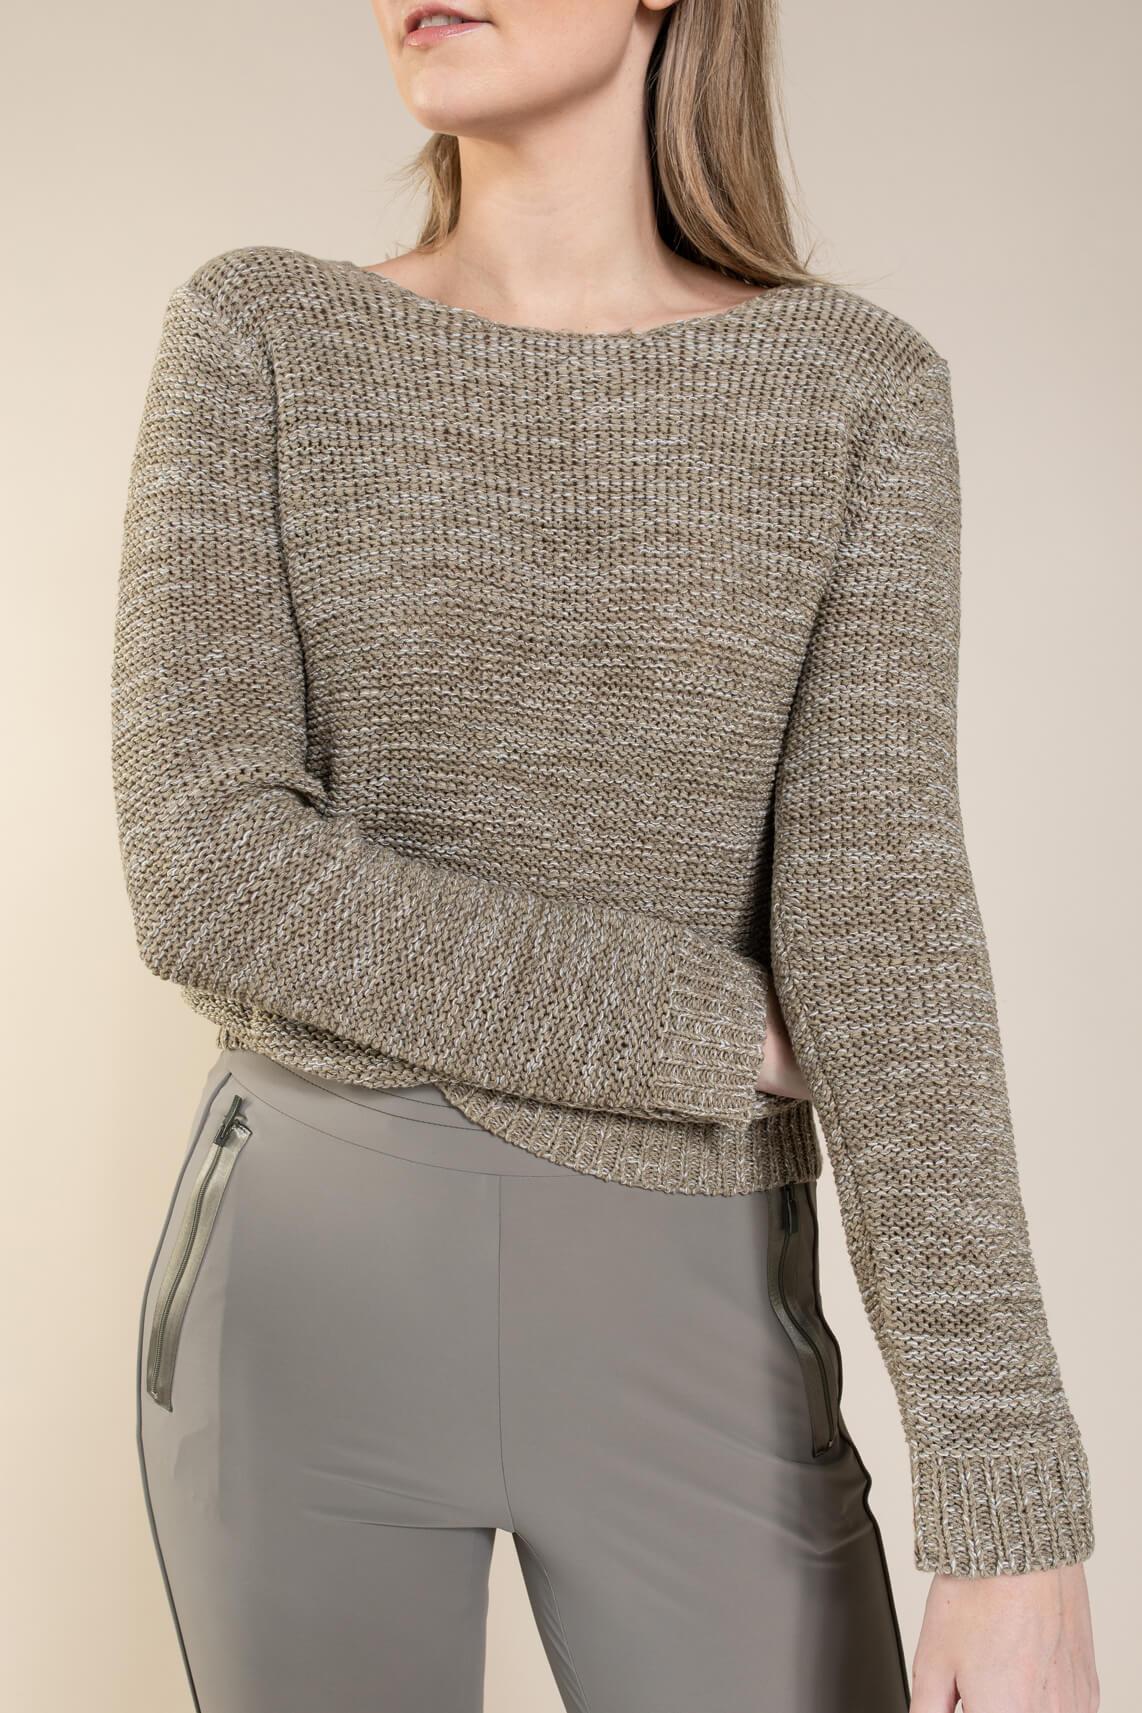 Anna Dames Pullover in bandgaren Groen